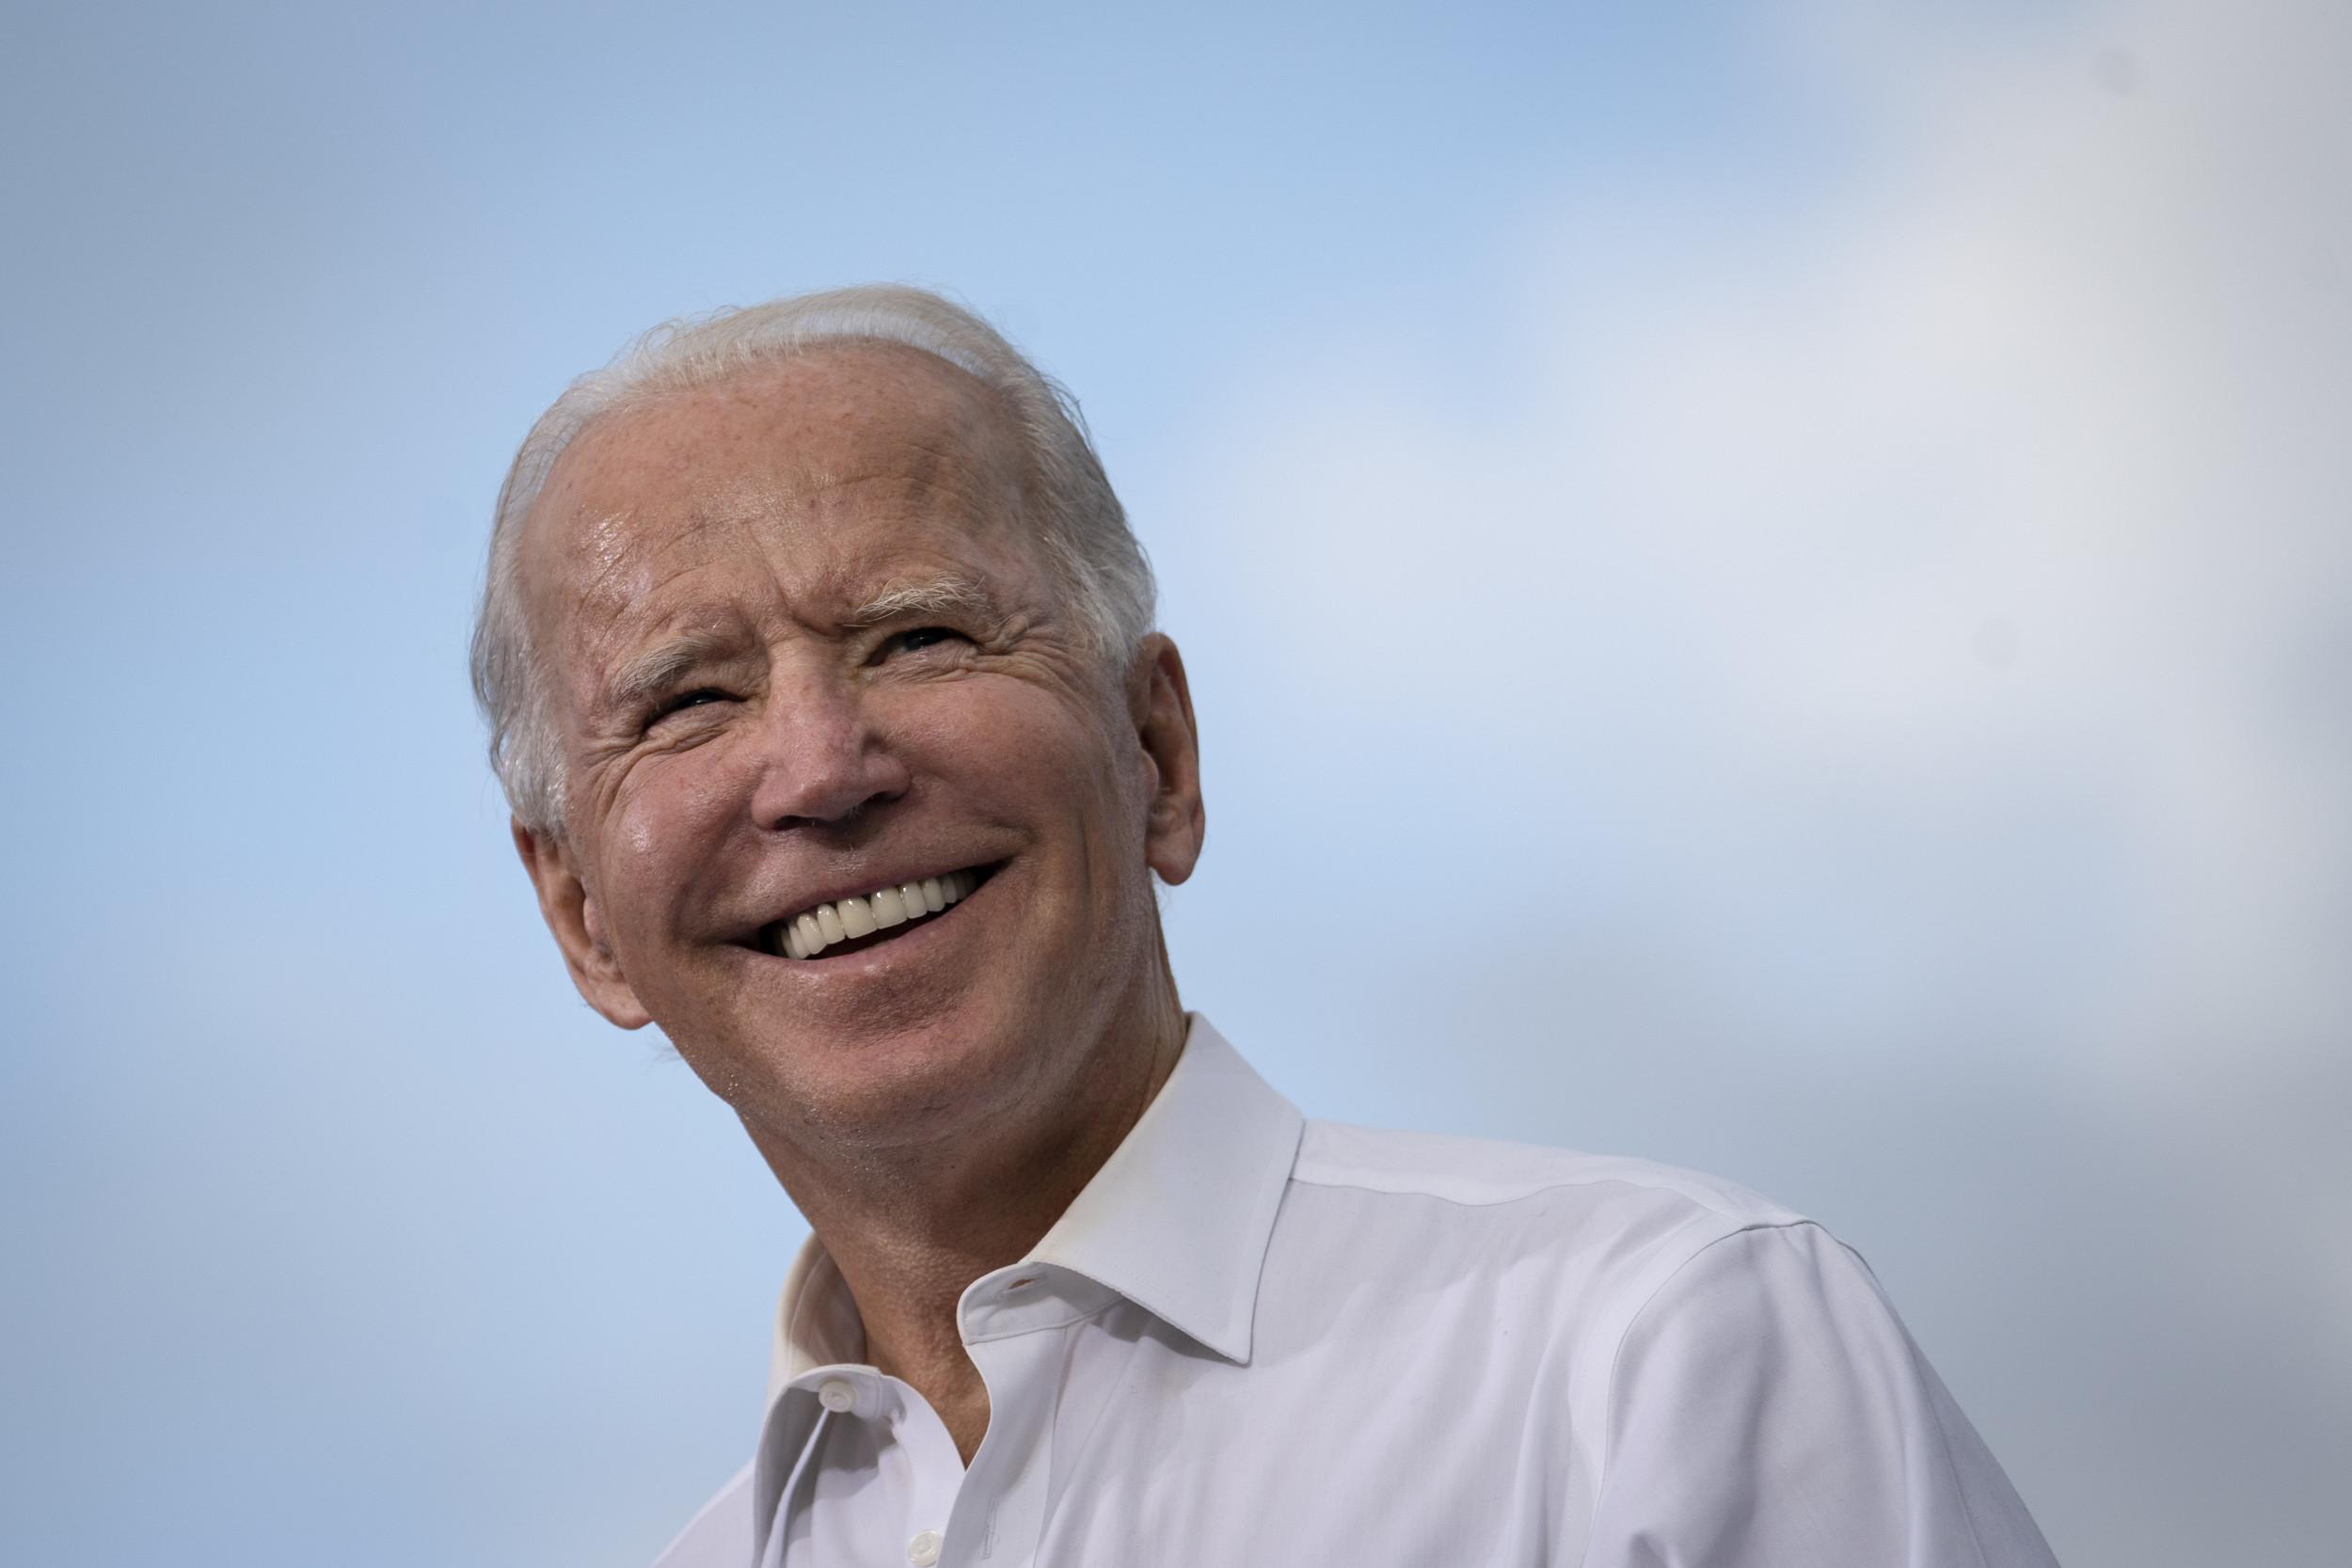 Majority of Americans view Joe Biden as more of a patriot than Donald Trump, new poll shows